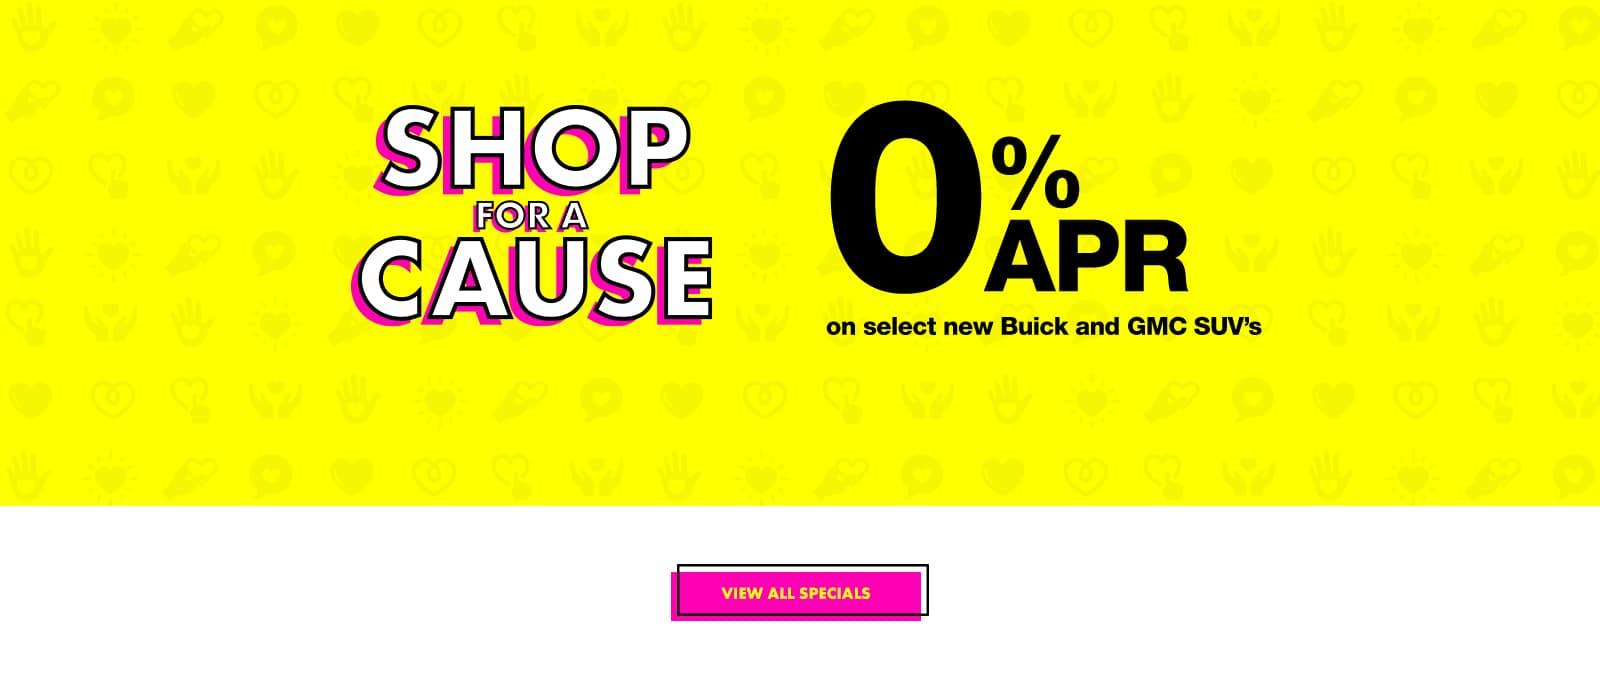 210607-BGB-FeatureSlide-ShopForACause-APR